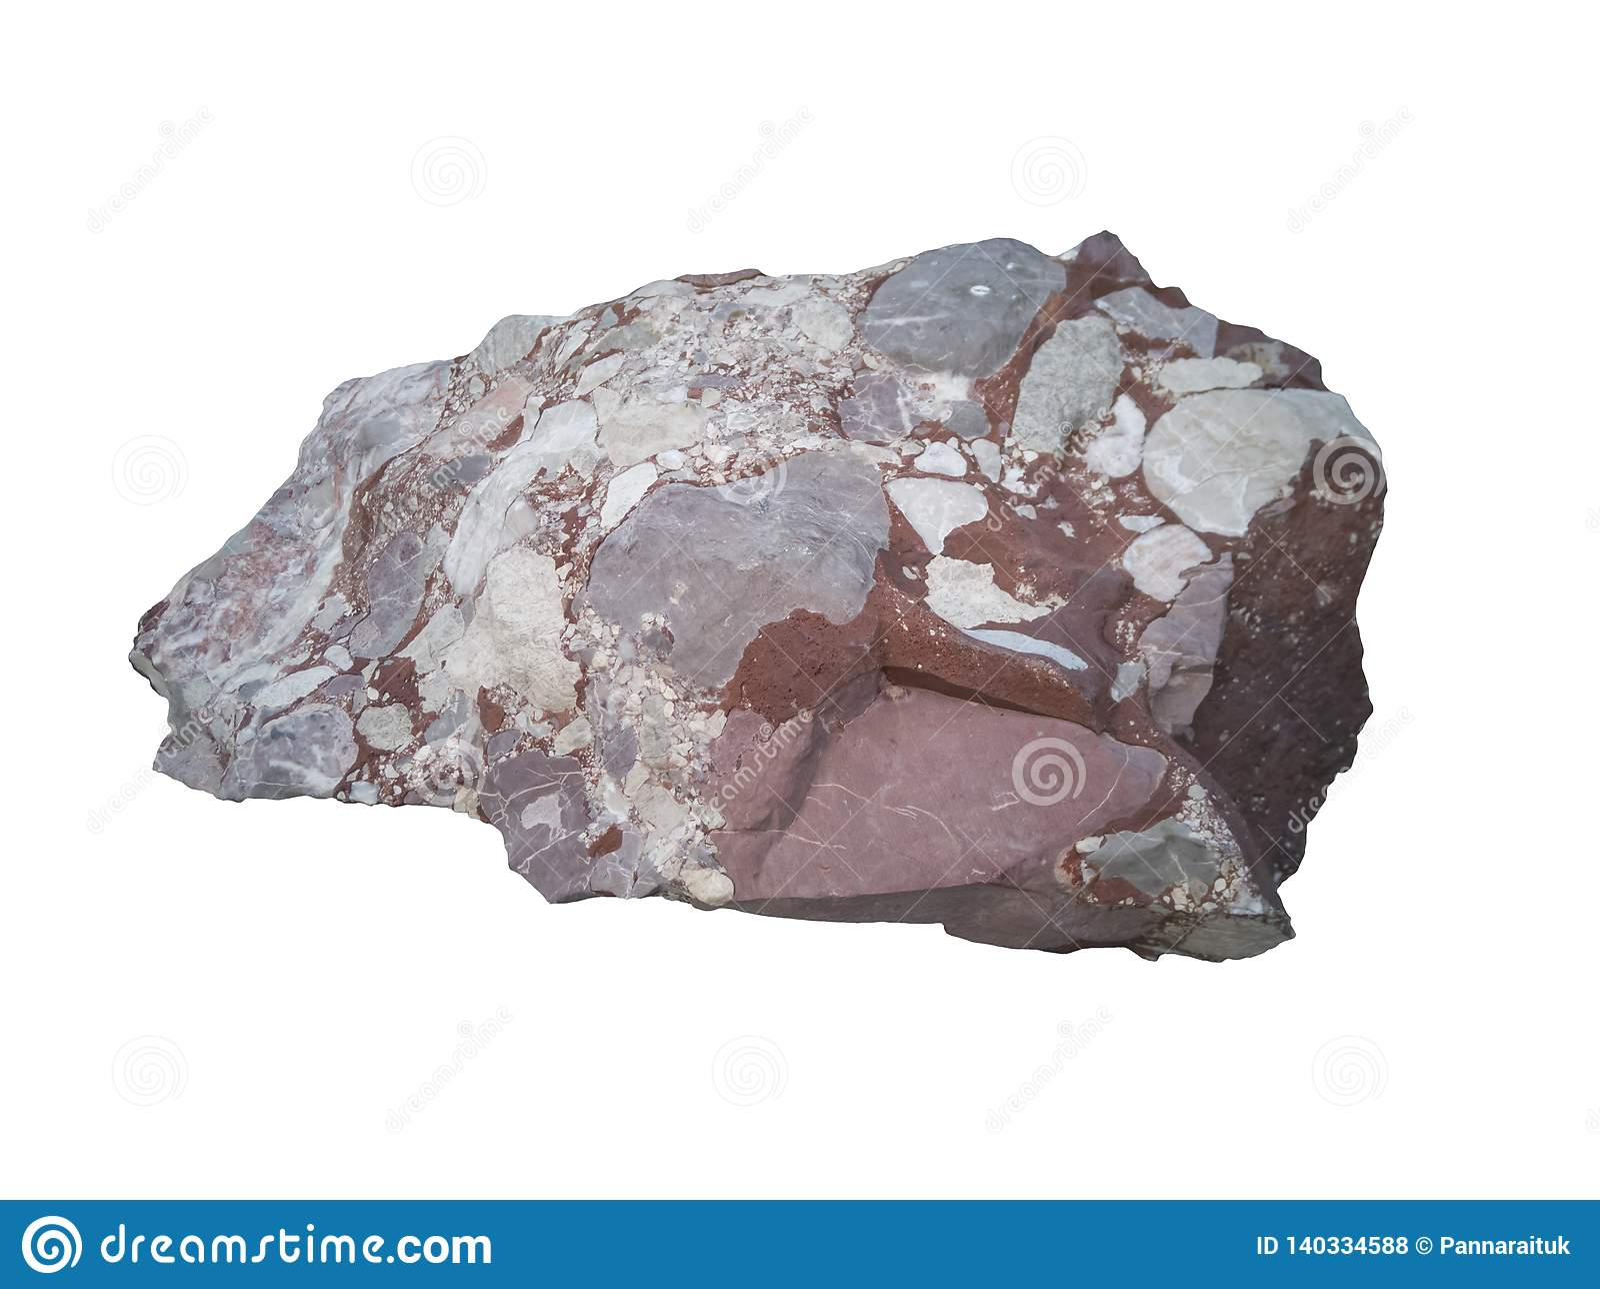 Conglomerate Stone Isolated On White Background Stock Photo